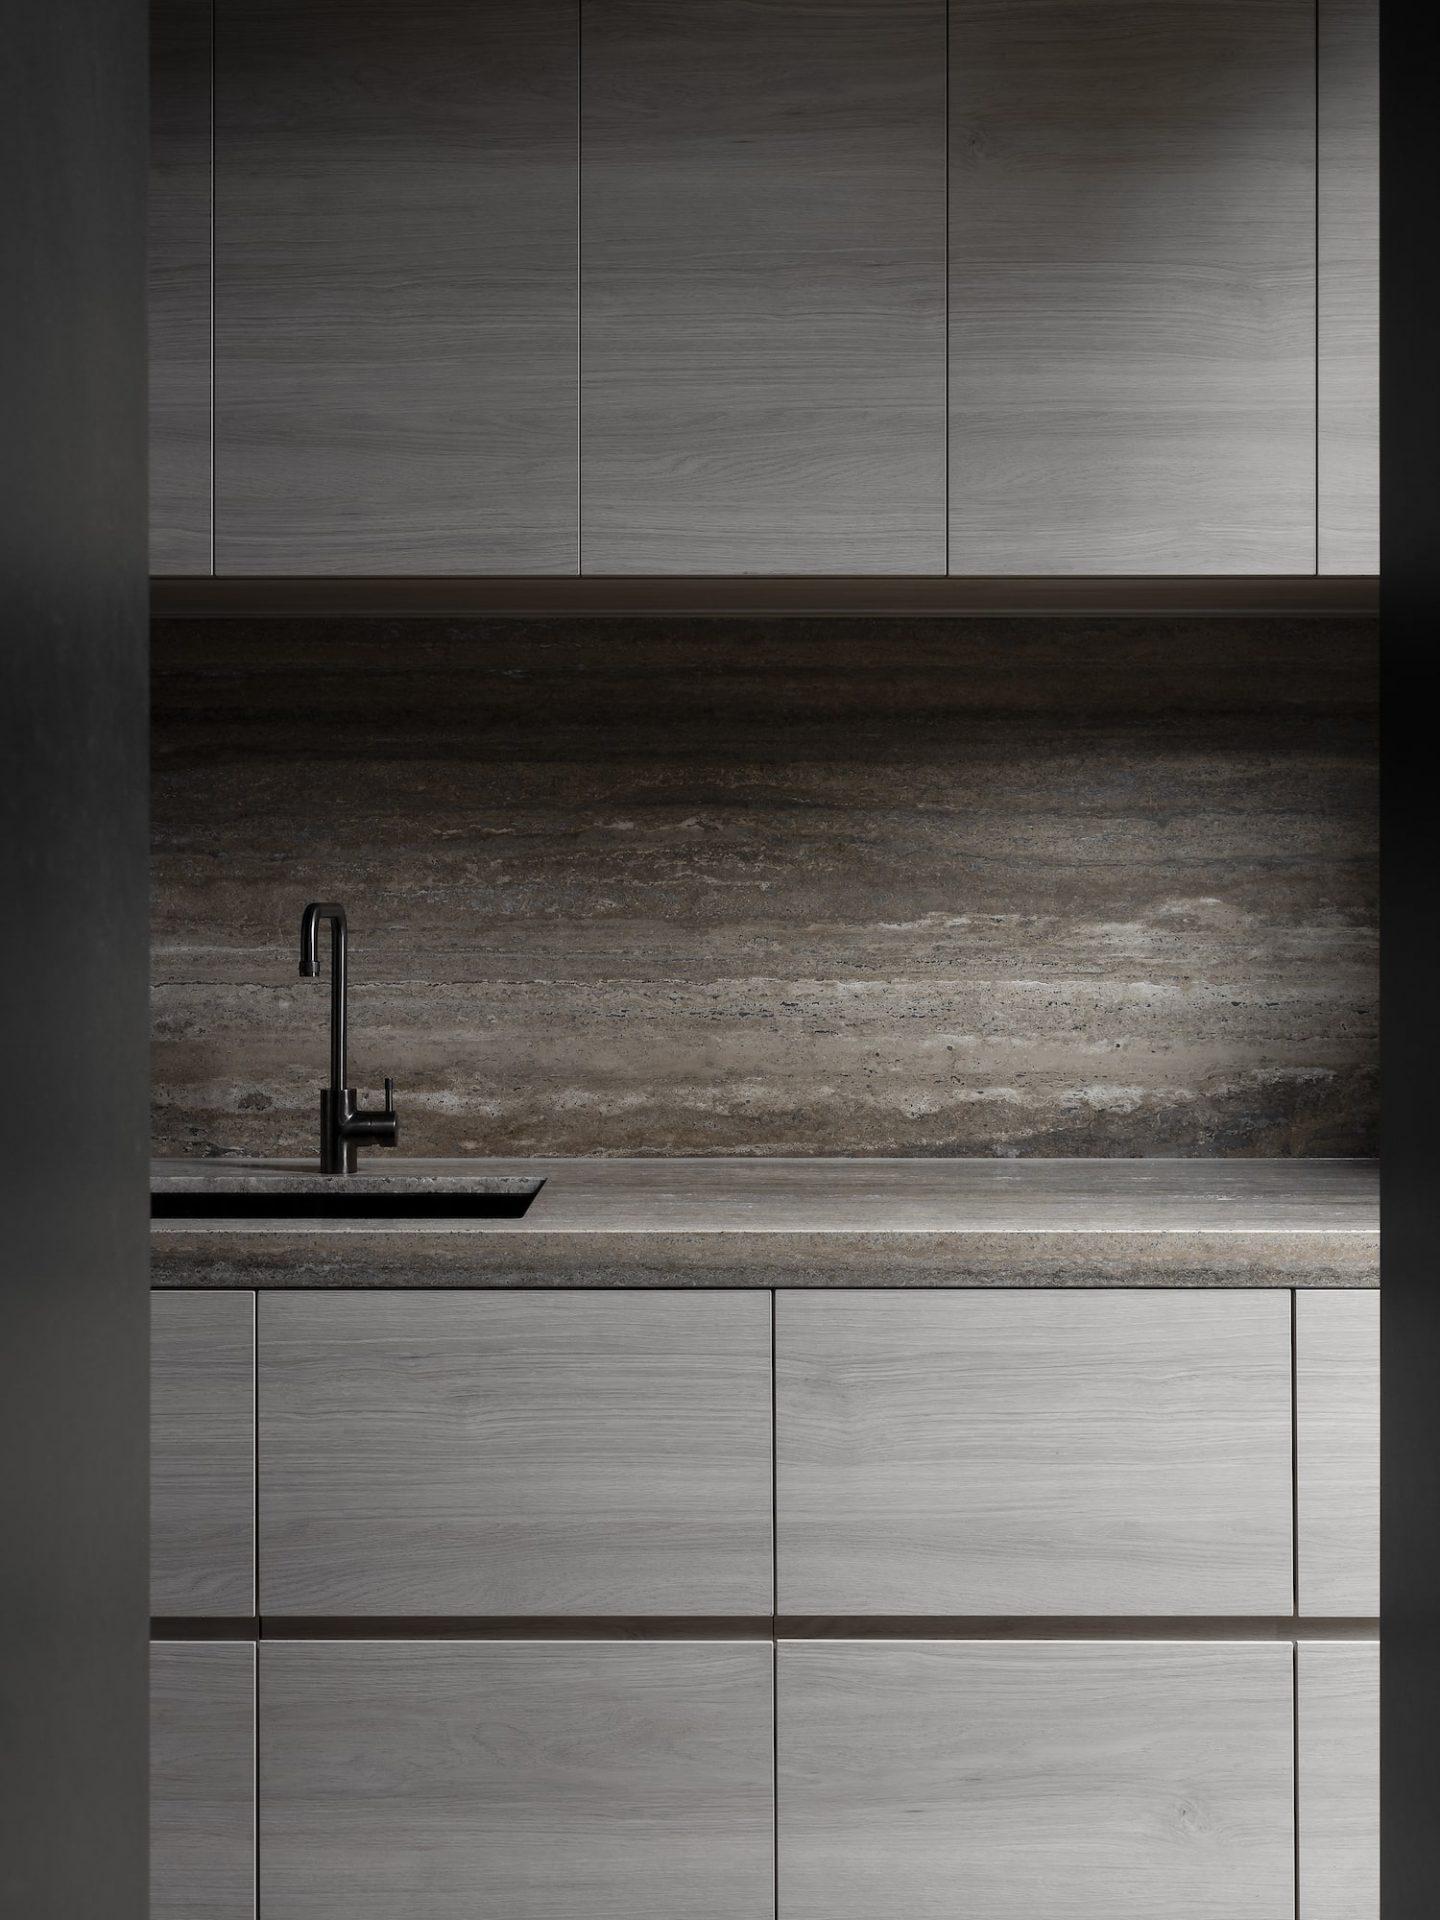 IGNANT-Architecture-Adam-Kane-Barwon-Heads-07-min